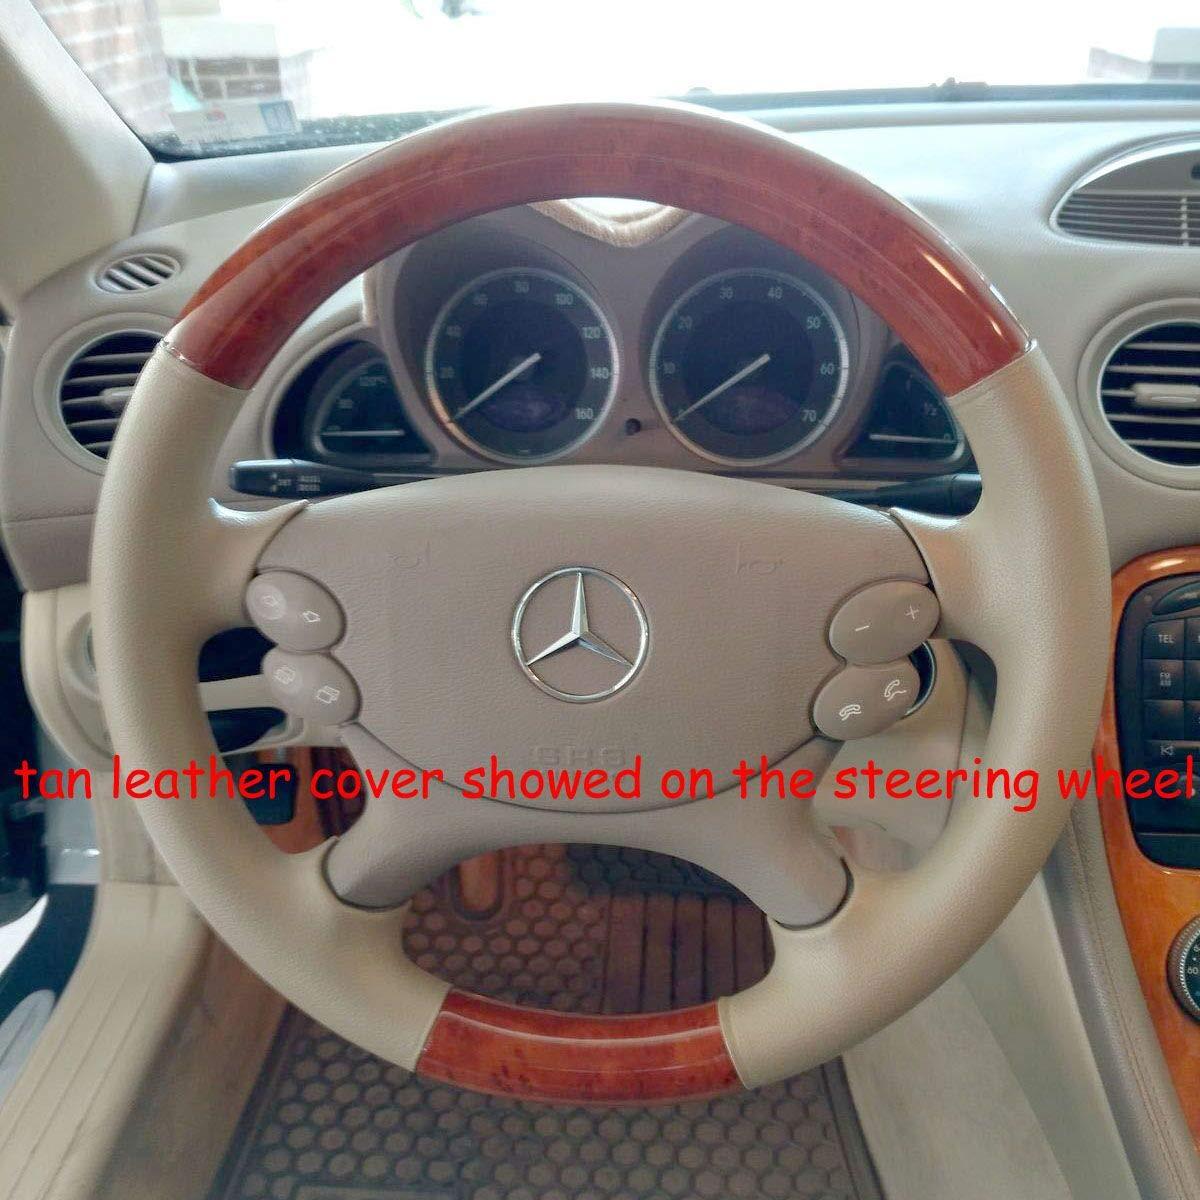 Leather Wood Steering Wheel Cover Mercedes 03-09 W209 A209 CLK R230 SL W219 CLS